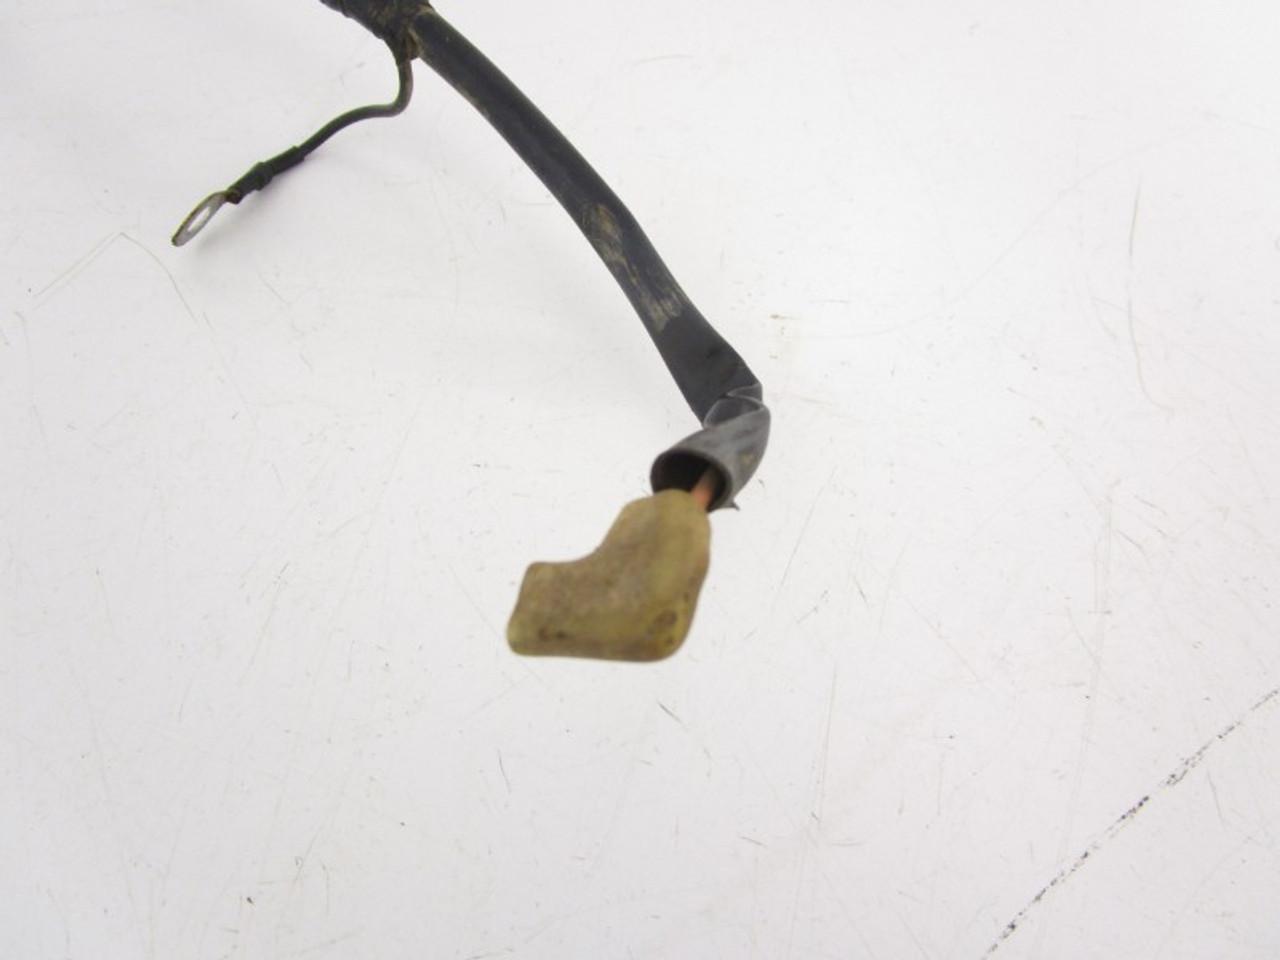 99 yamaha yzf 400 yz 400f used wire harness wiring plug connector